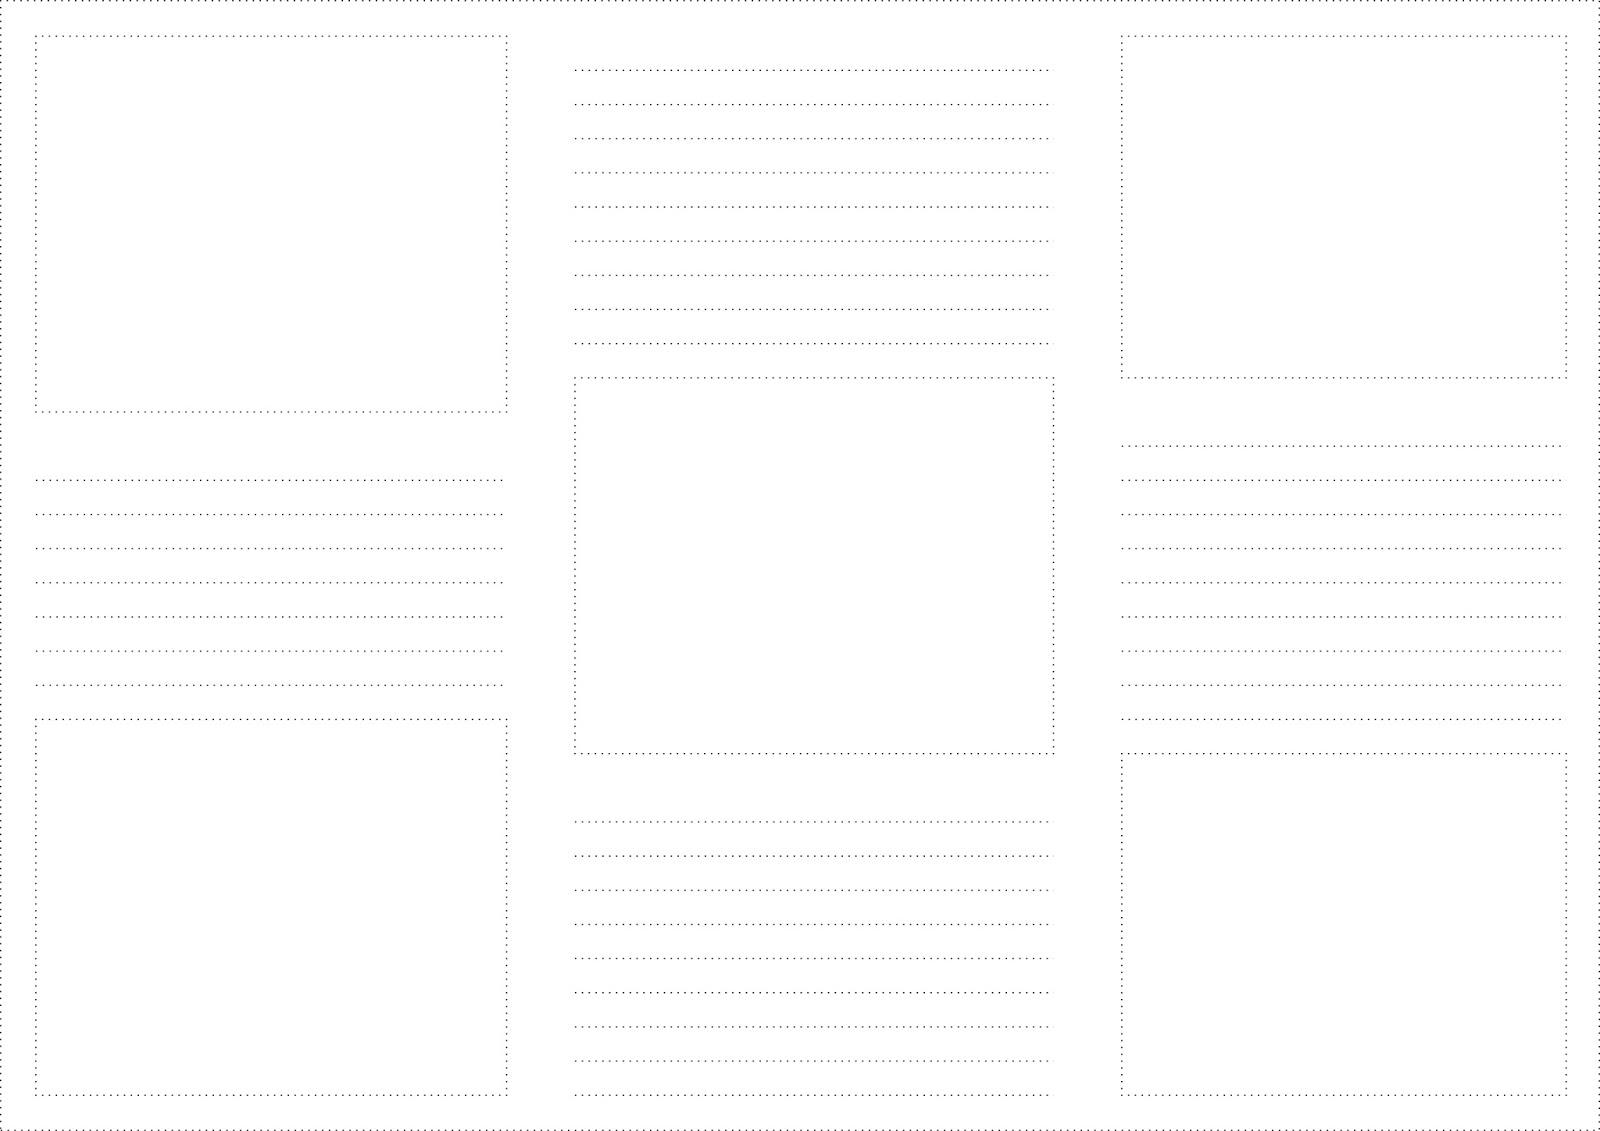 Worksheet Templates